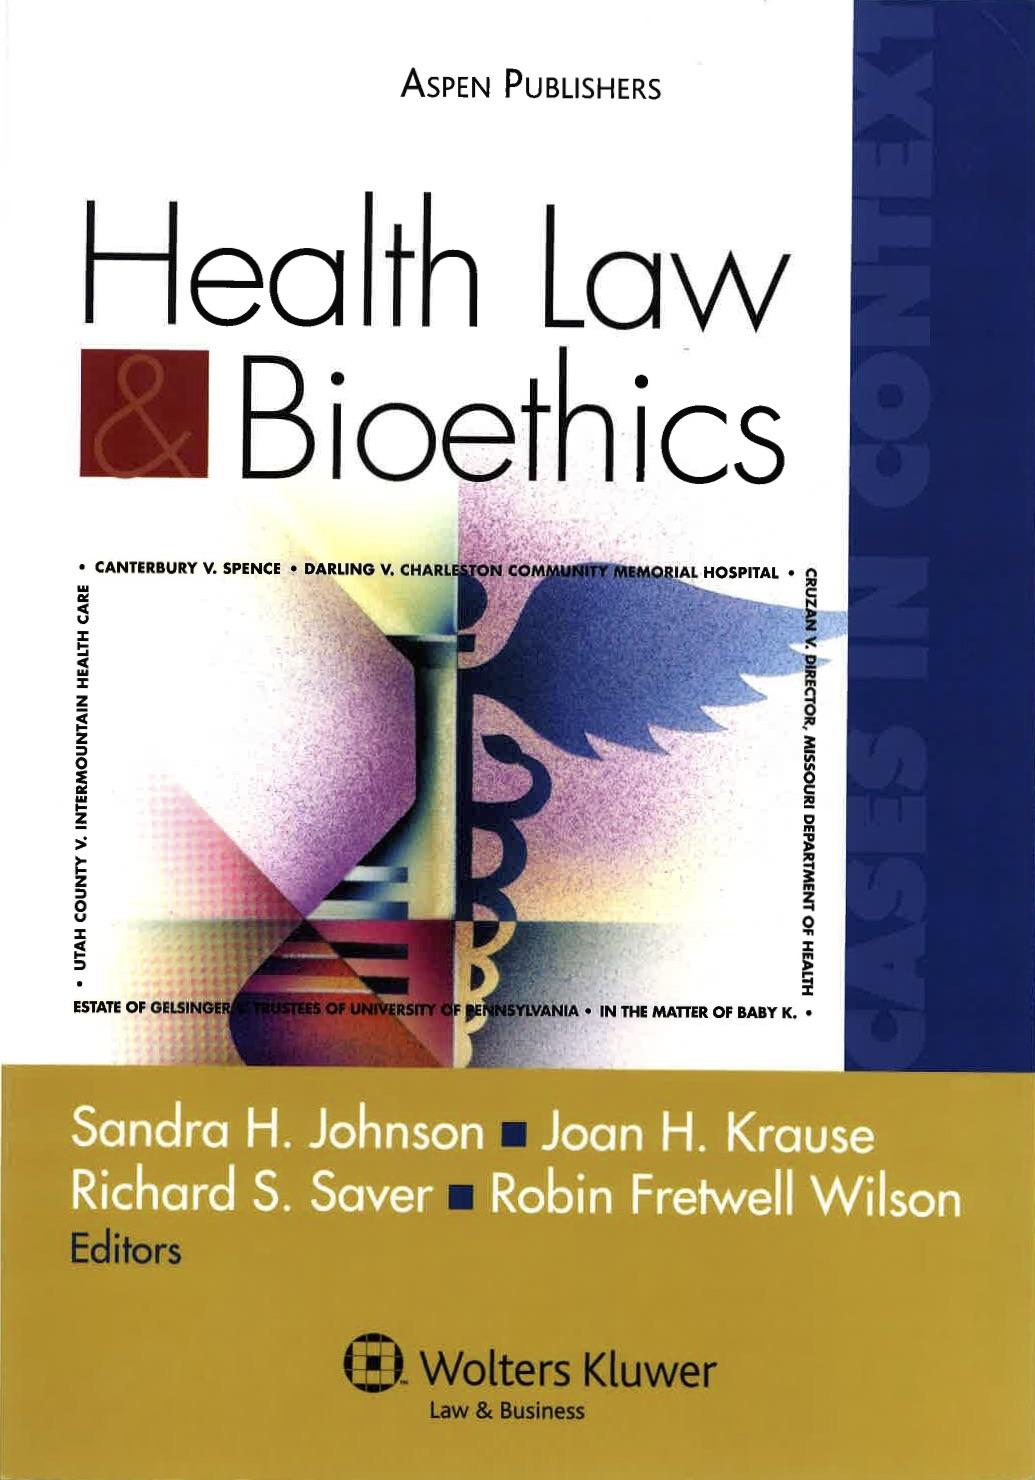 Health Law & Bioethics